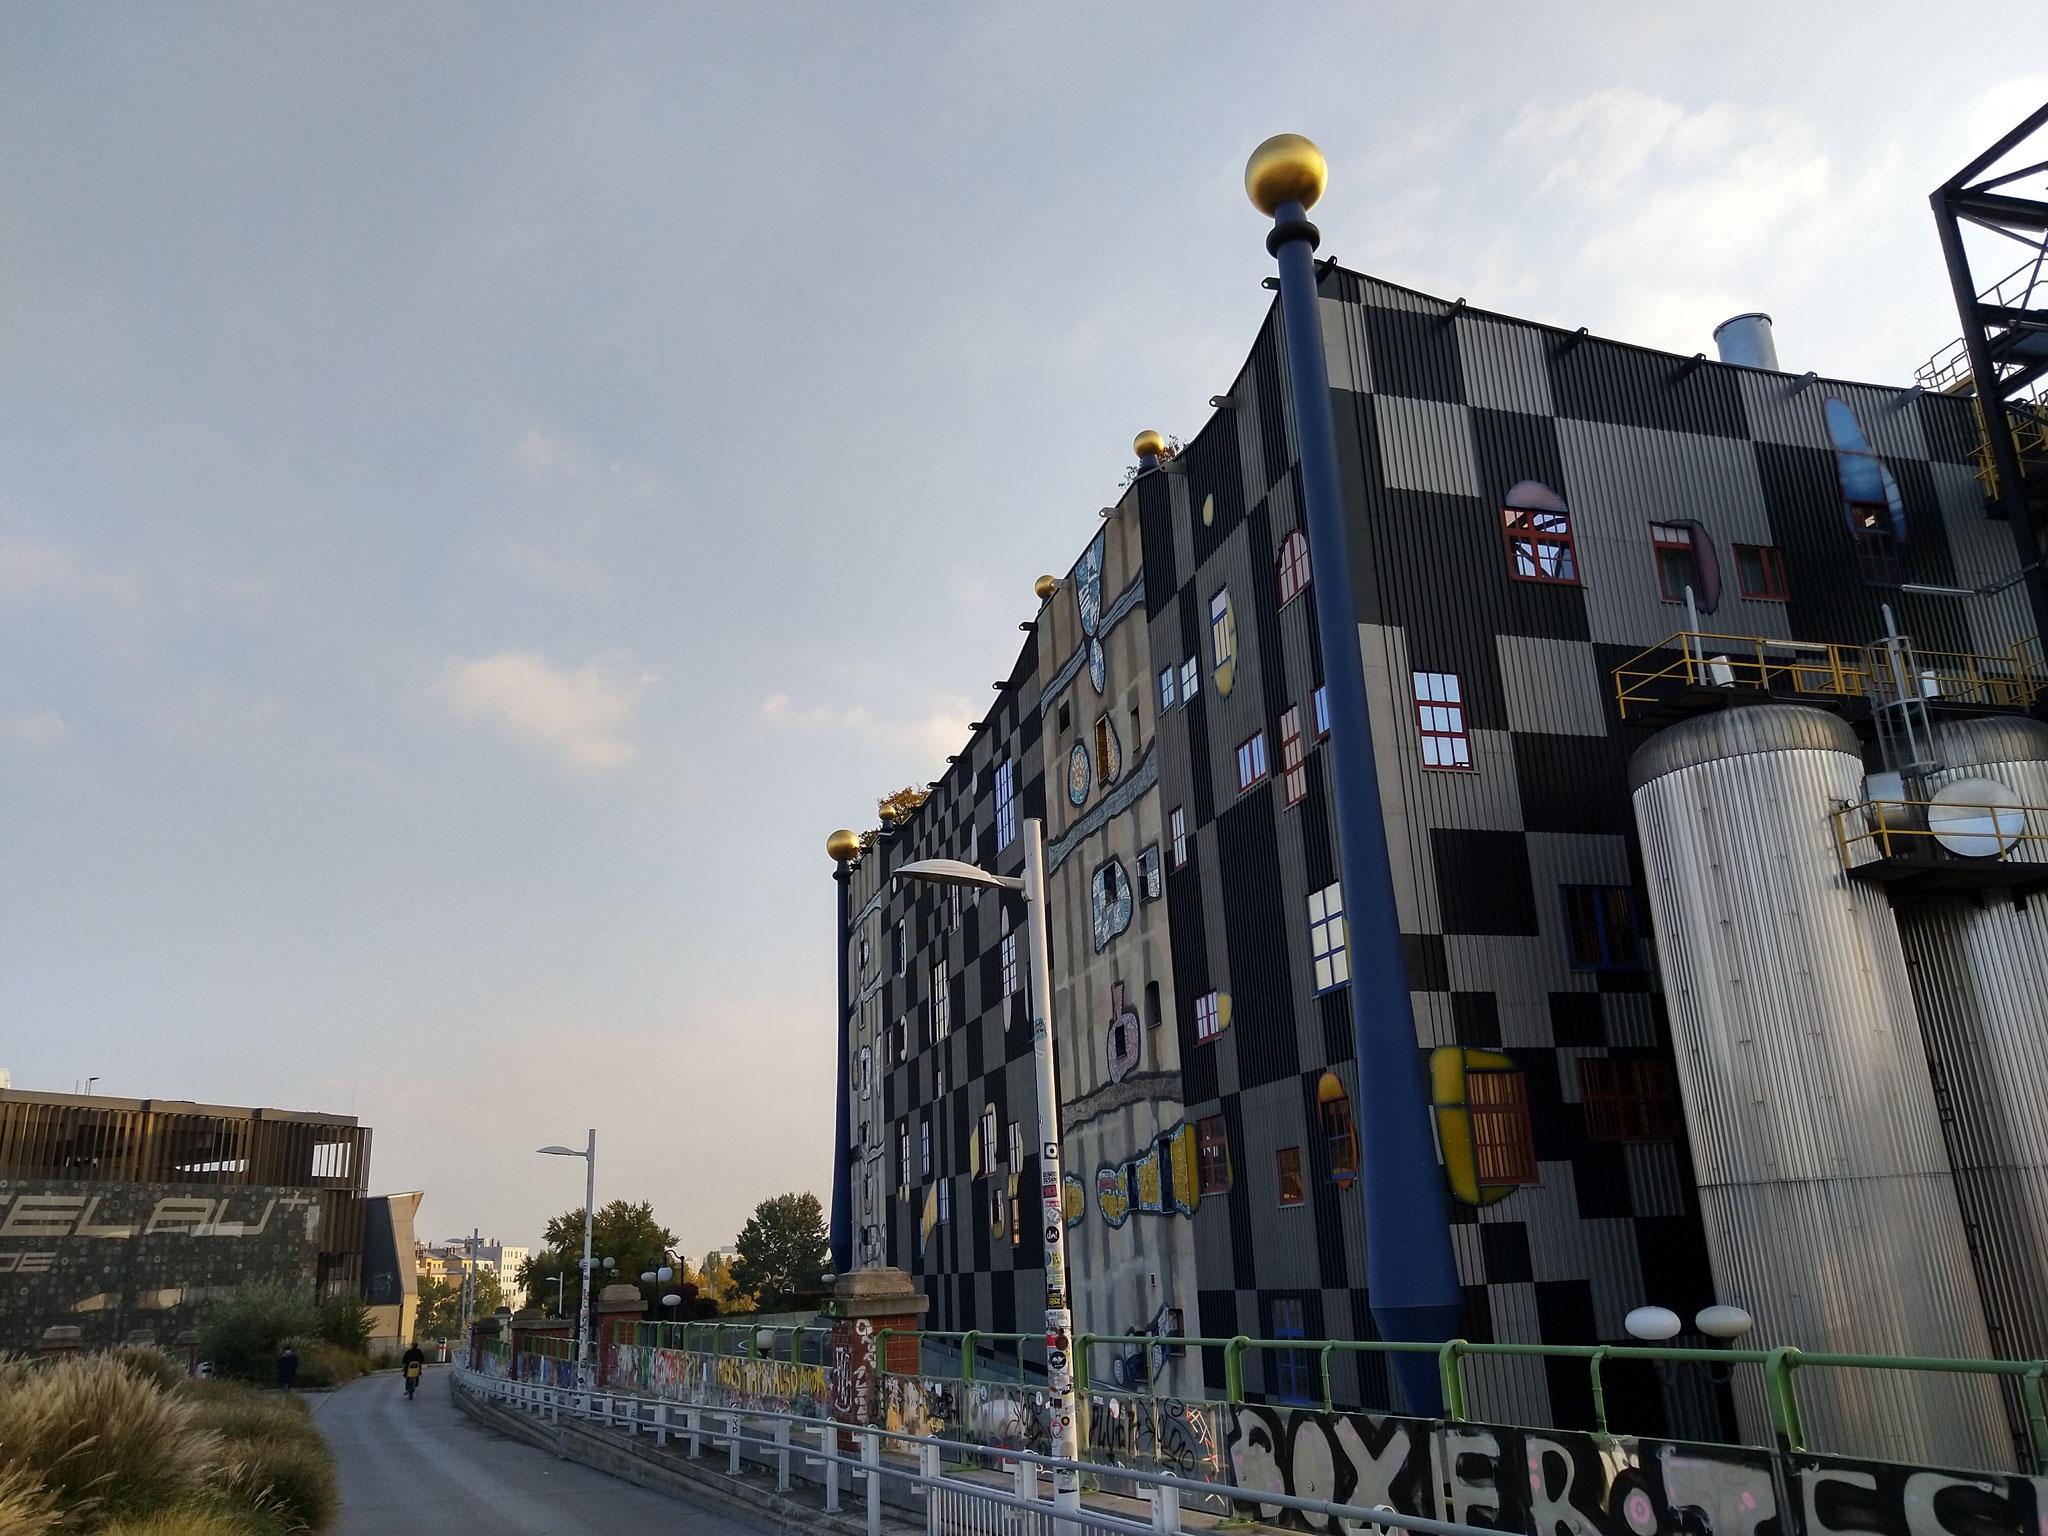 Giro Hundertwasser in bici